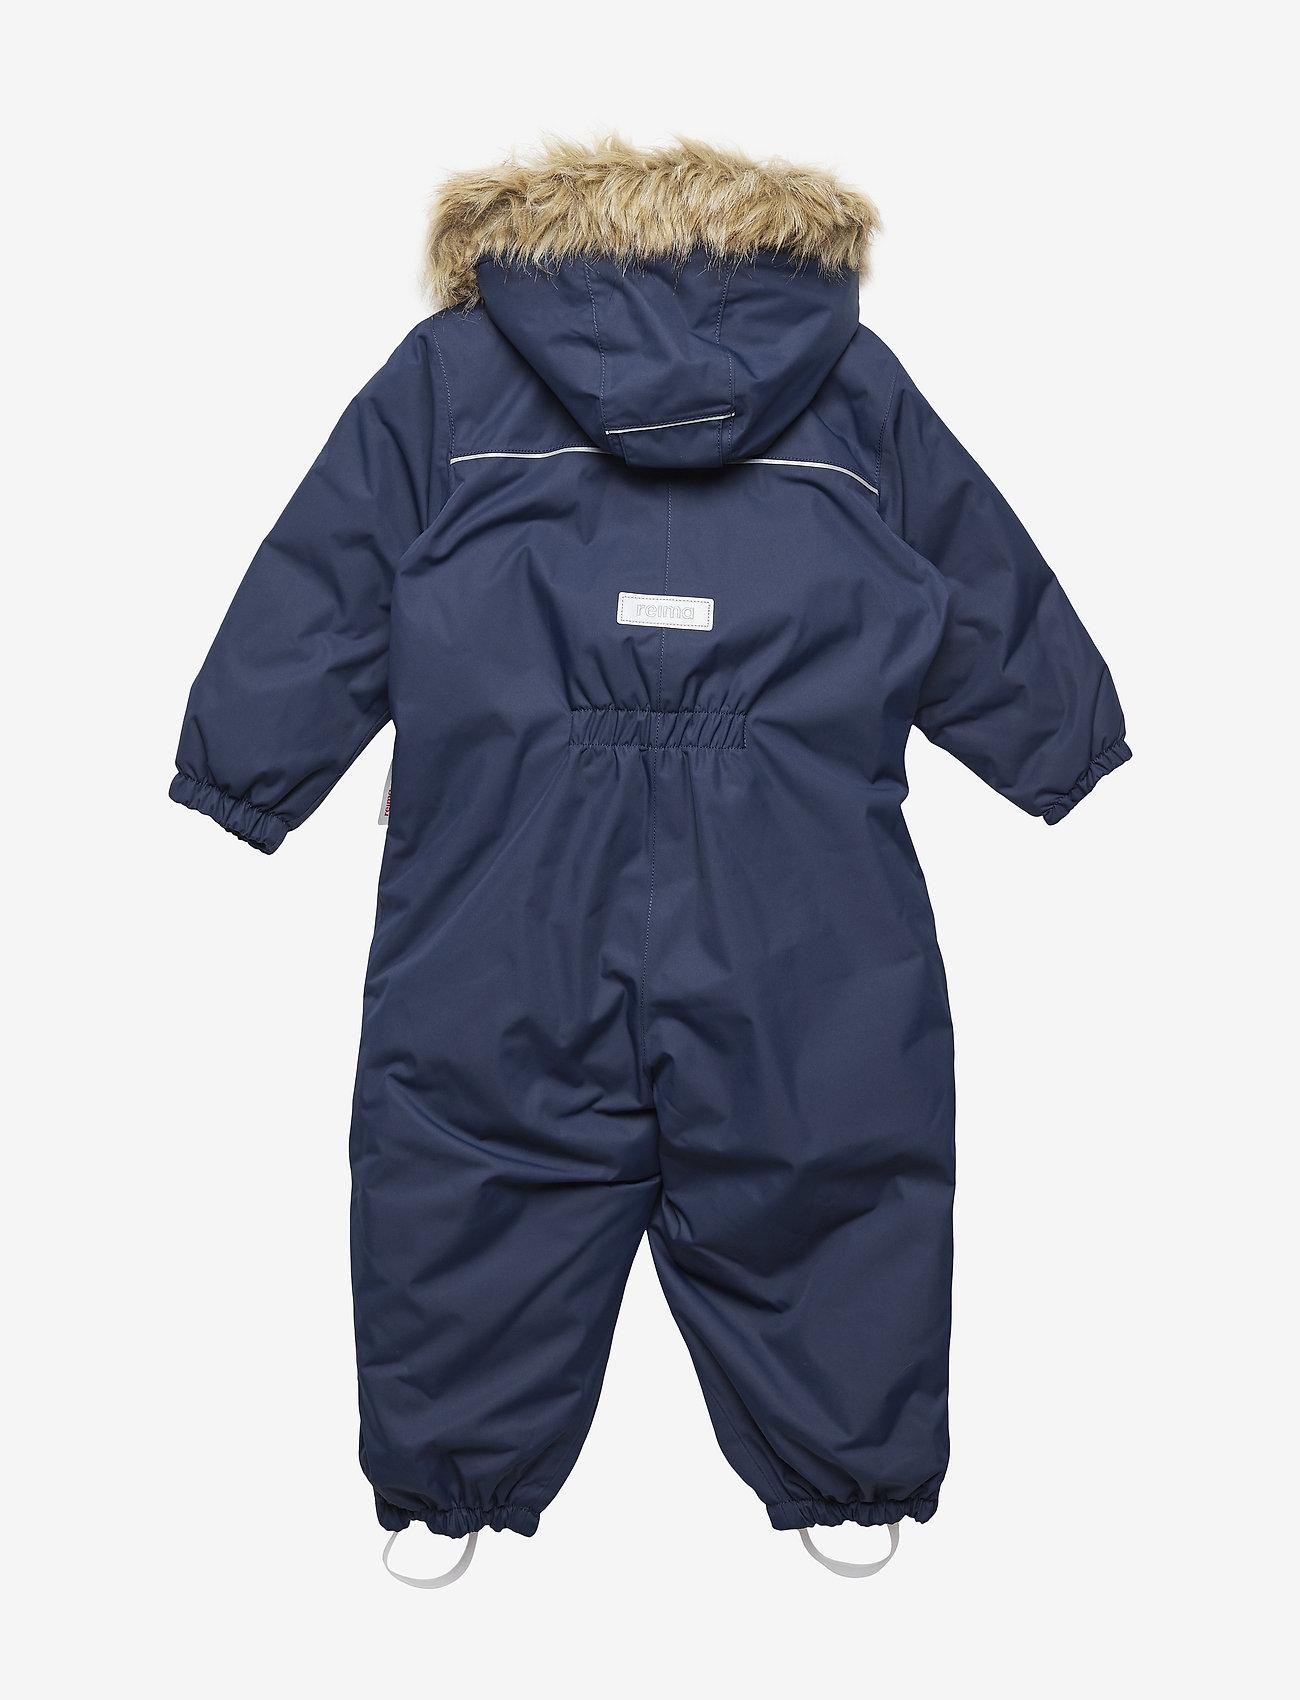 Reima - Reimatec winter overall, Gotland Dark berry,80 cm - snowsuit - navy - 1